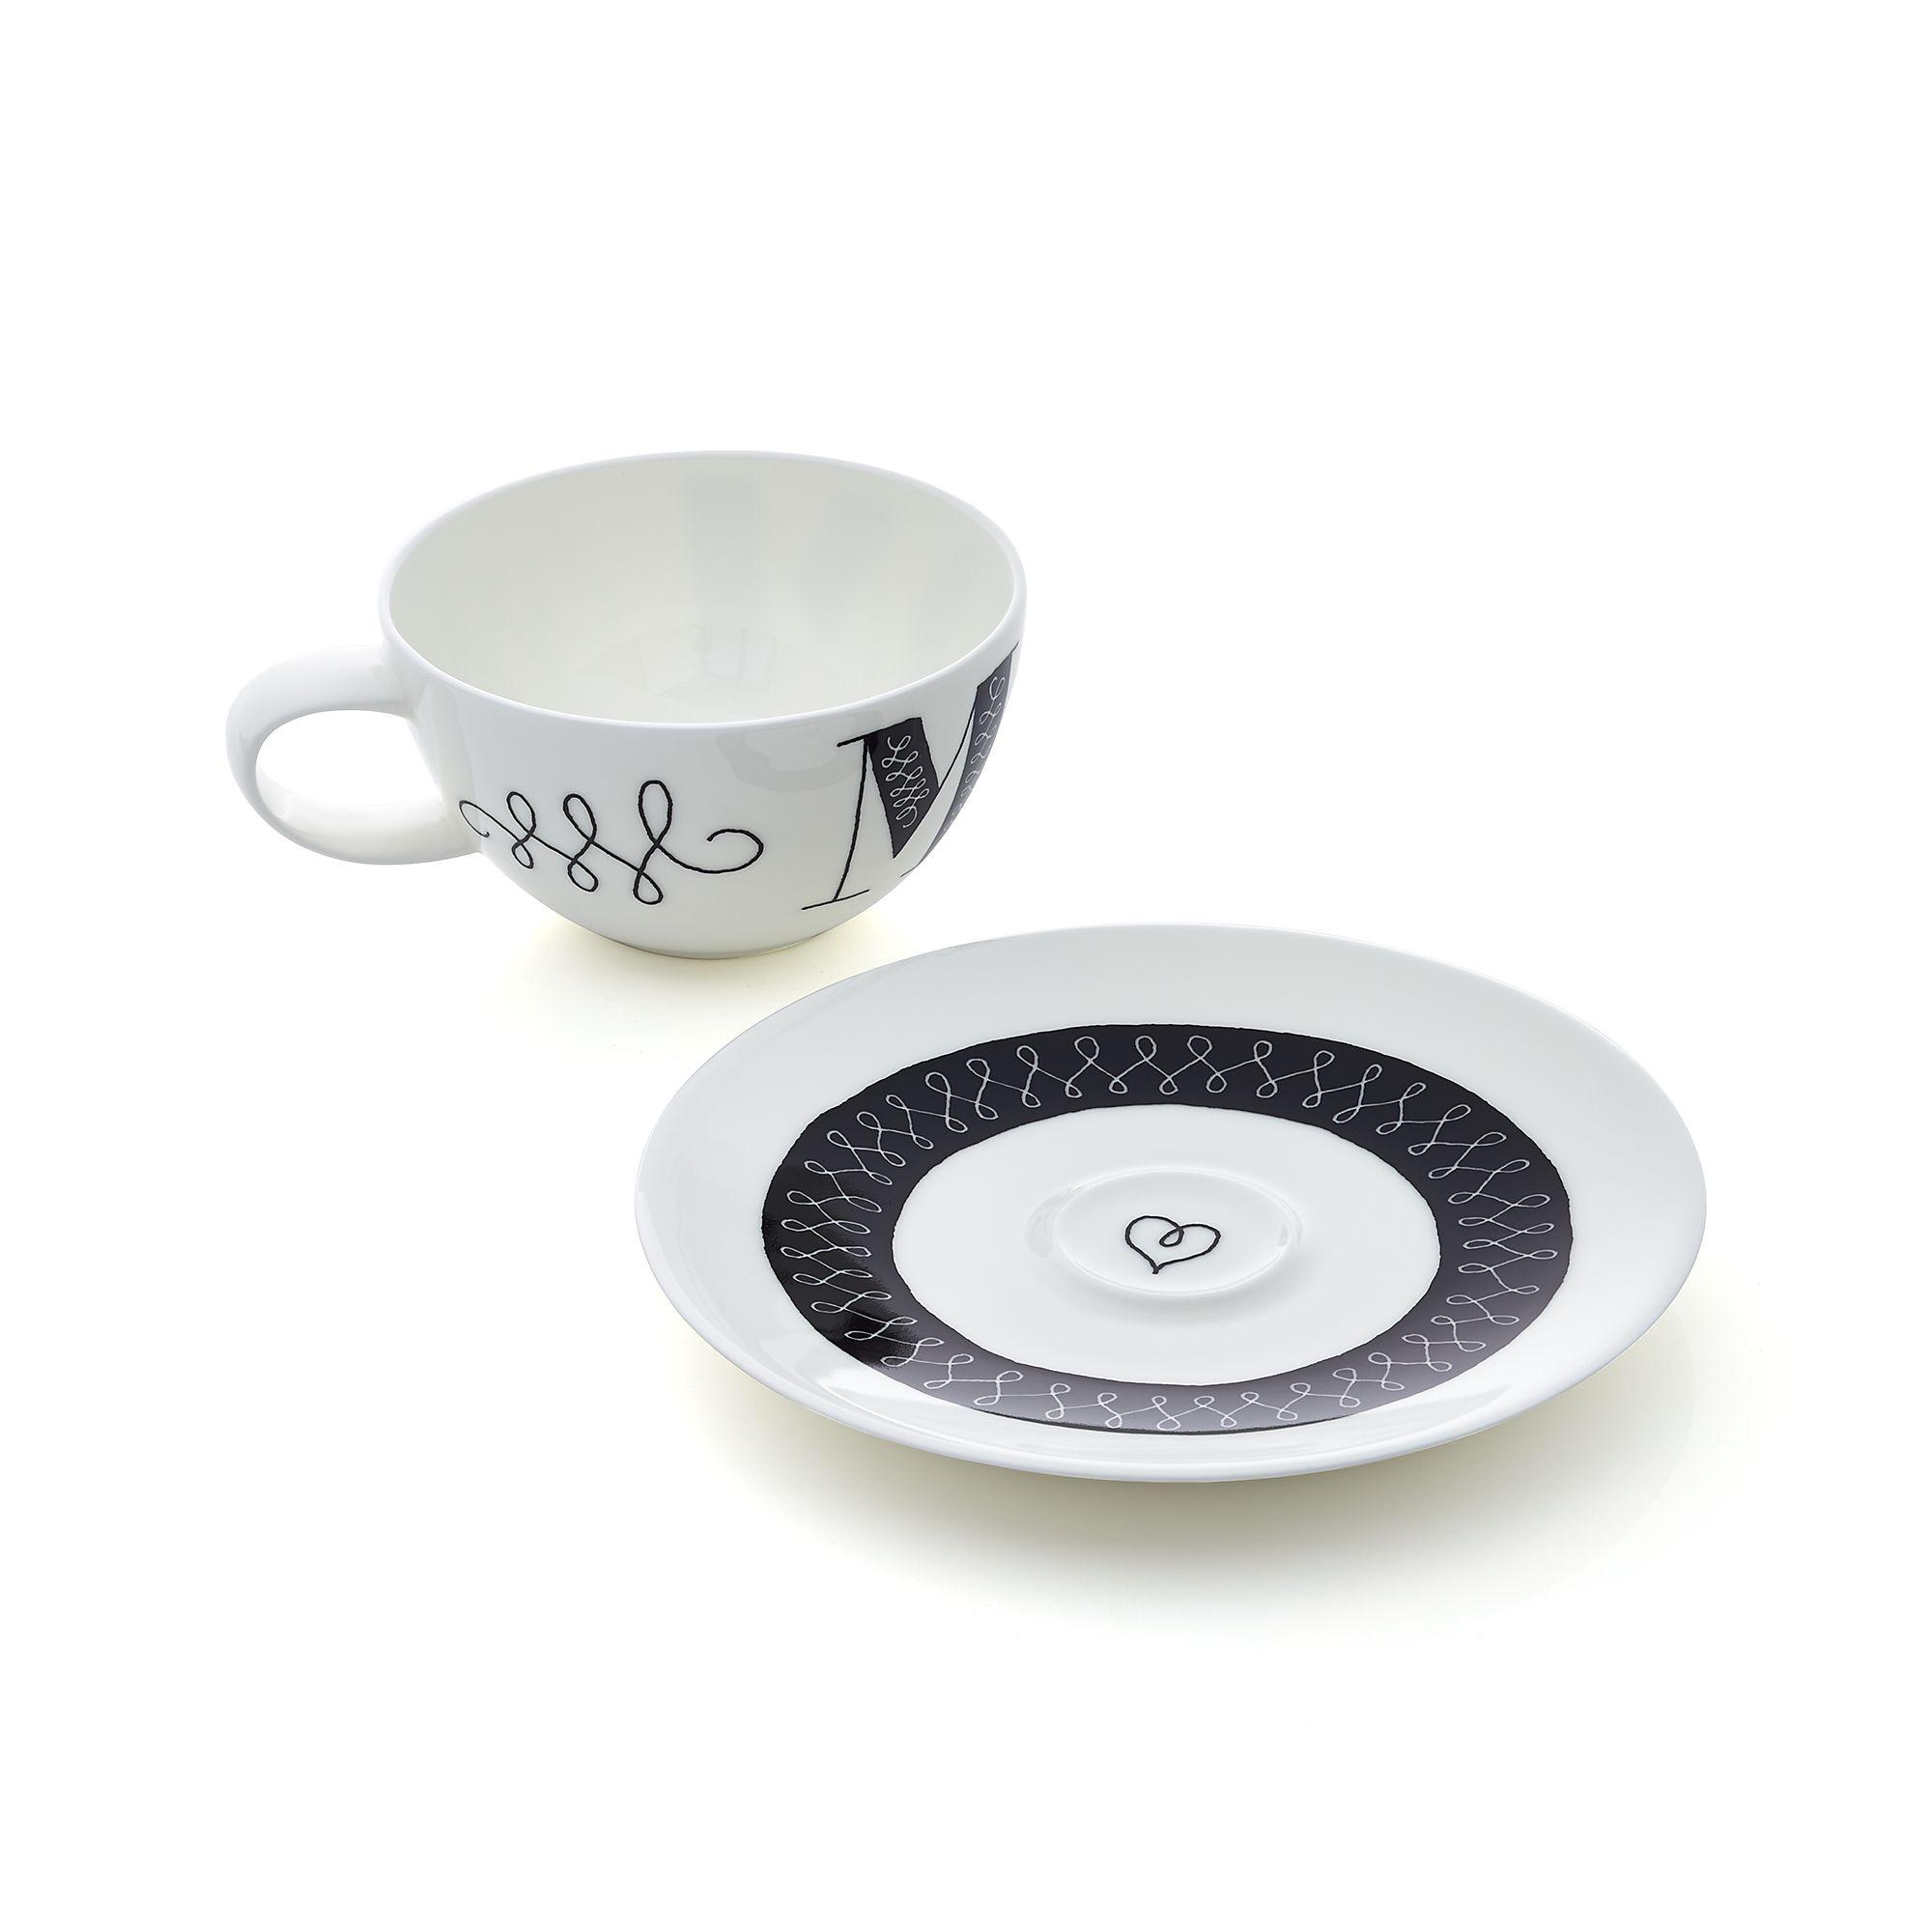 jude-landry-designer-teacup (1).jpg